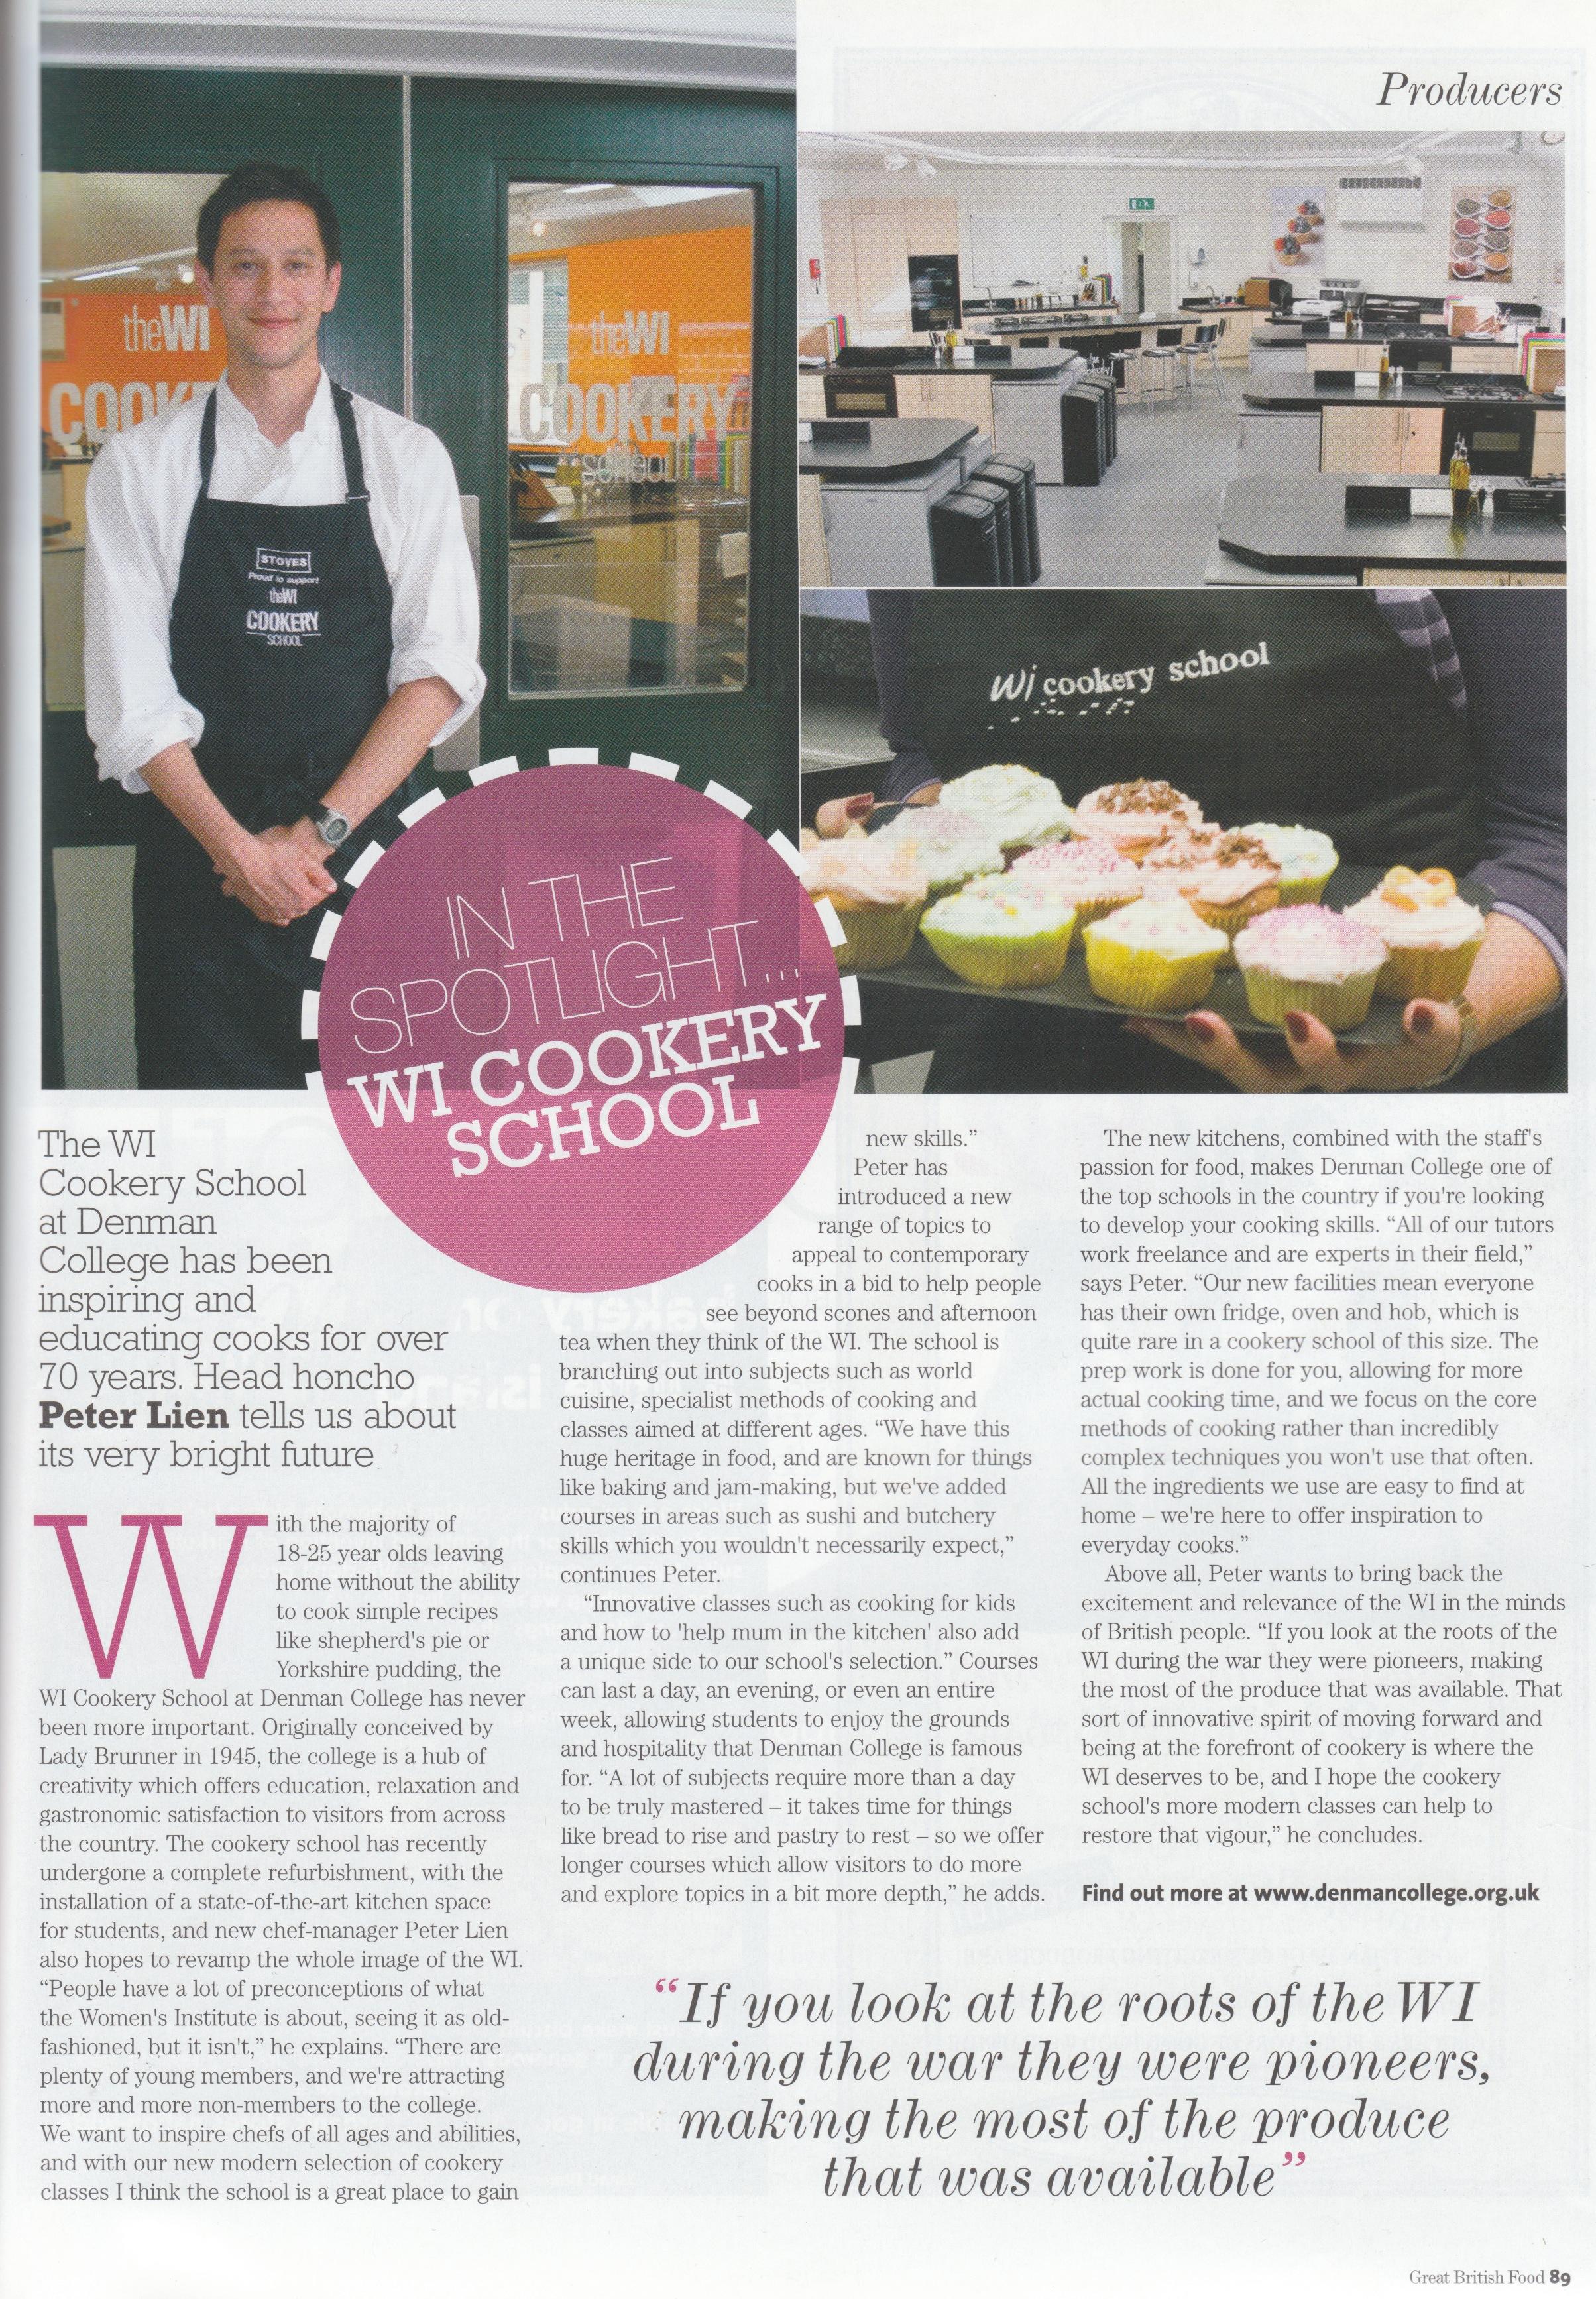 Great British Food Magazine, Jan/Feb 2011